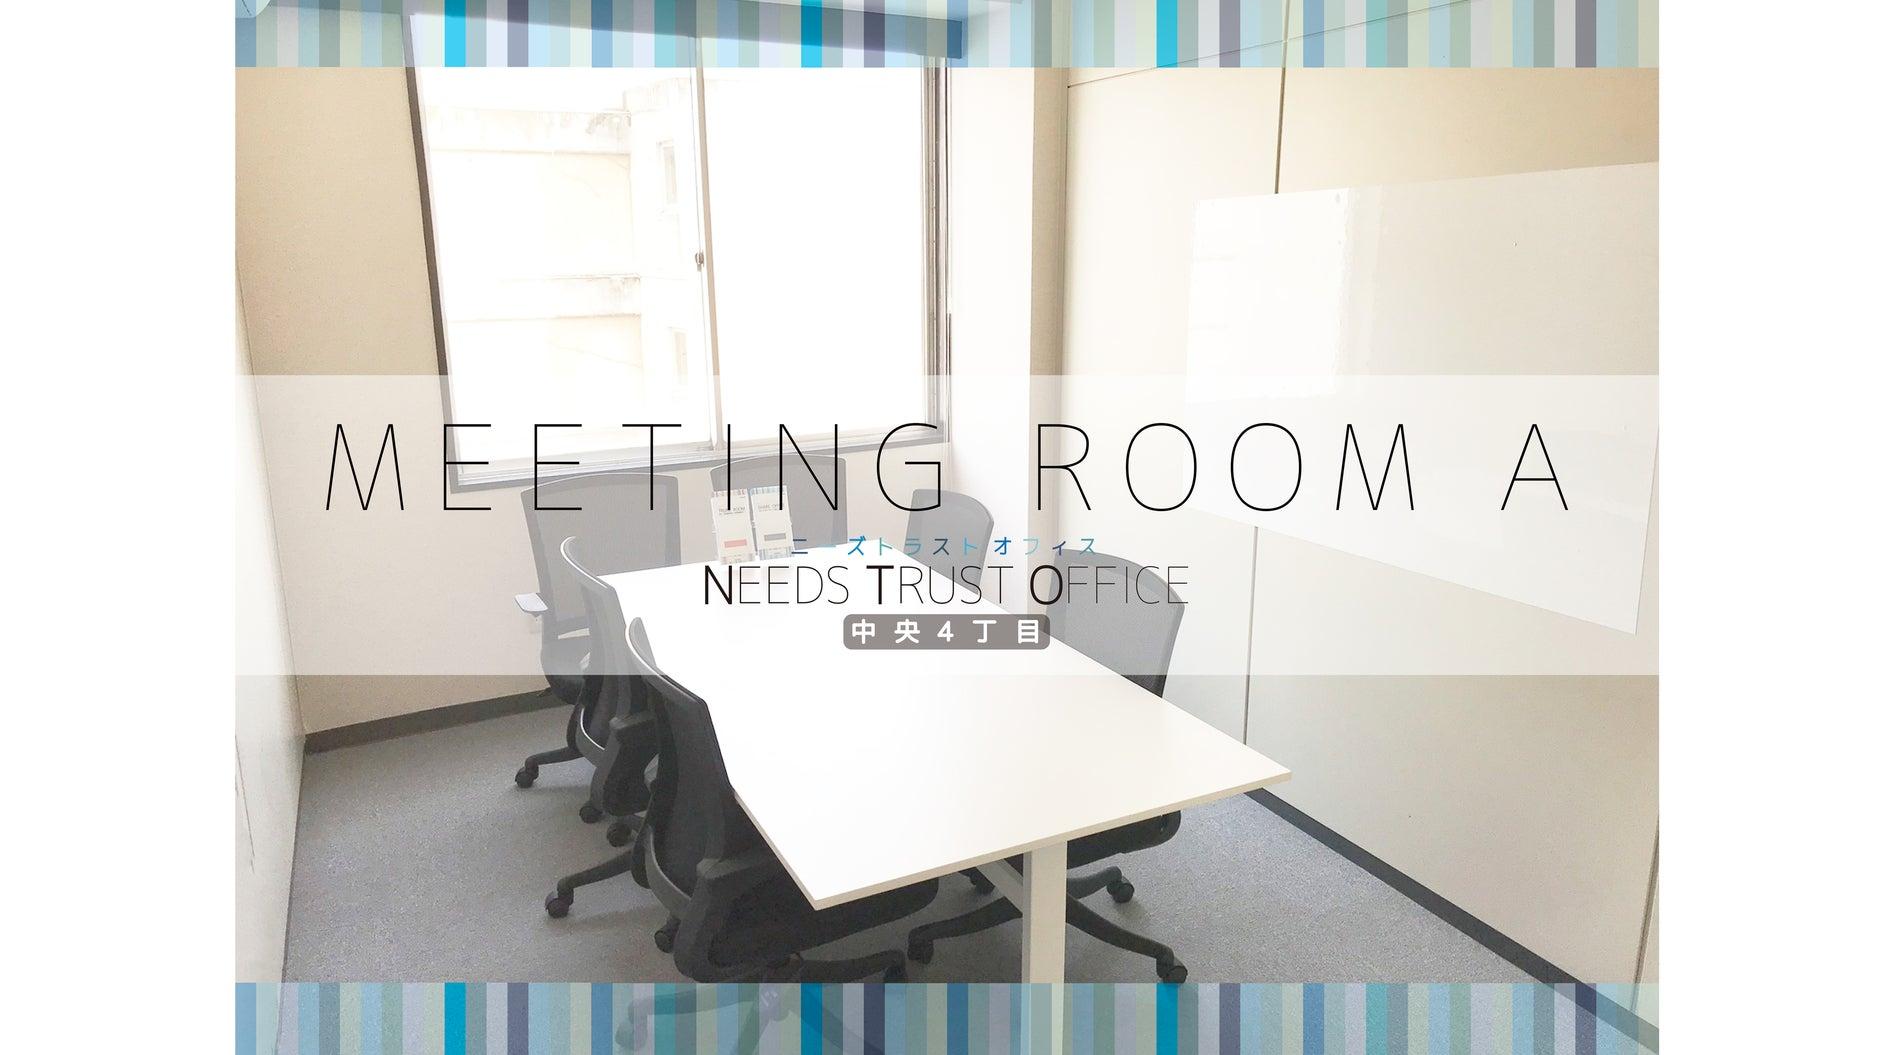 <NTO MEETING ROOM A>仙台駅西口より徒歩5分/シェアオフィス内の会議室 の写真